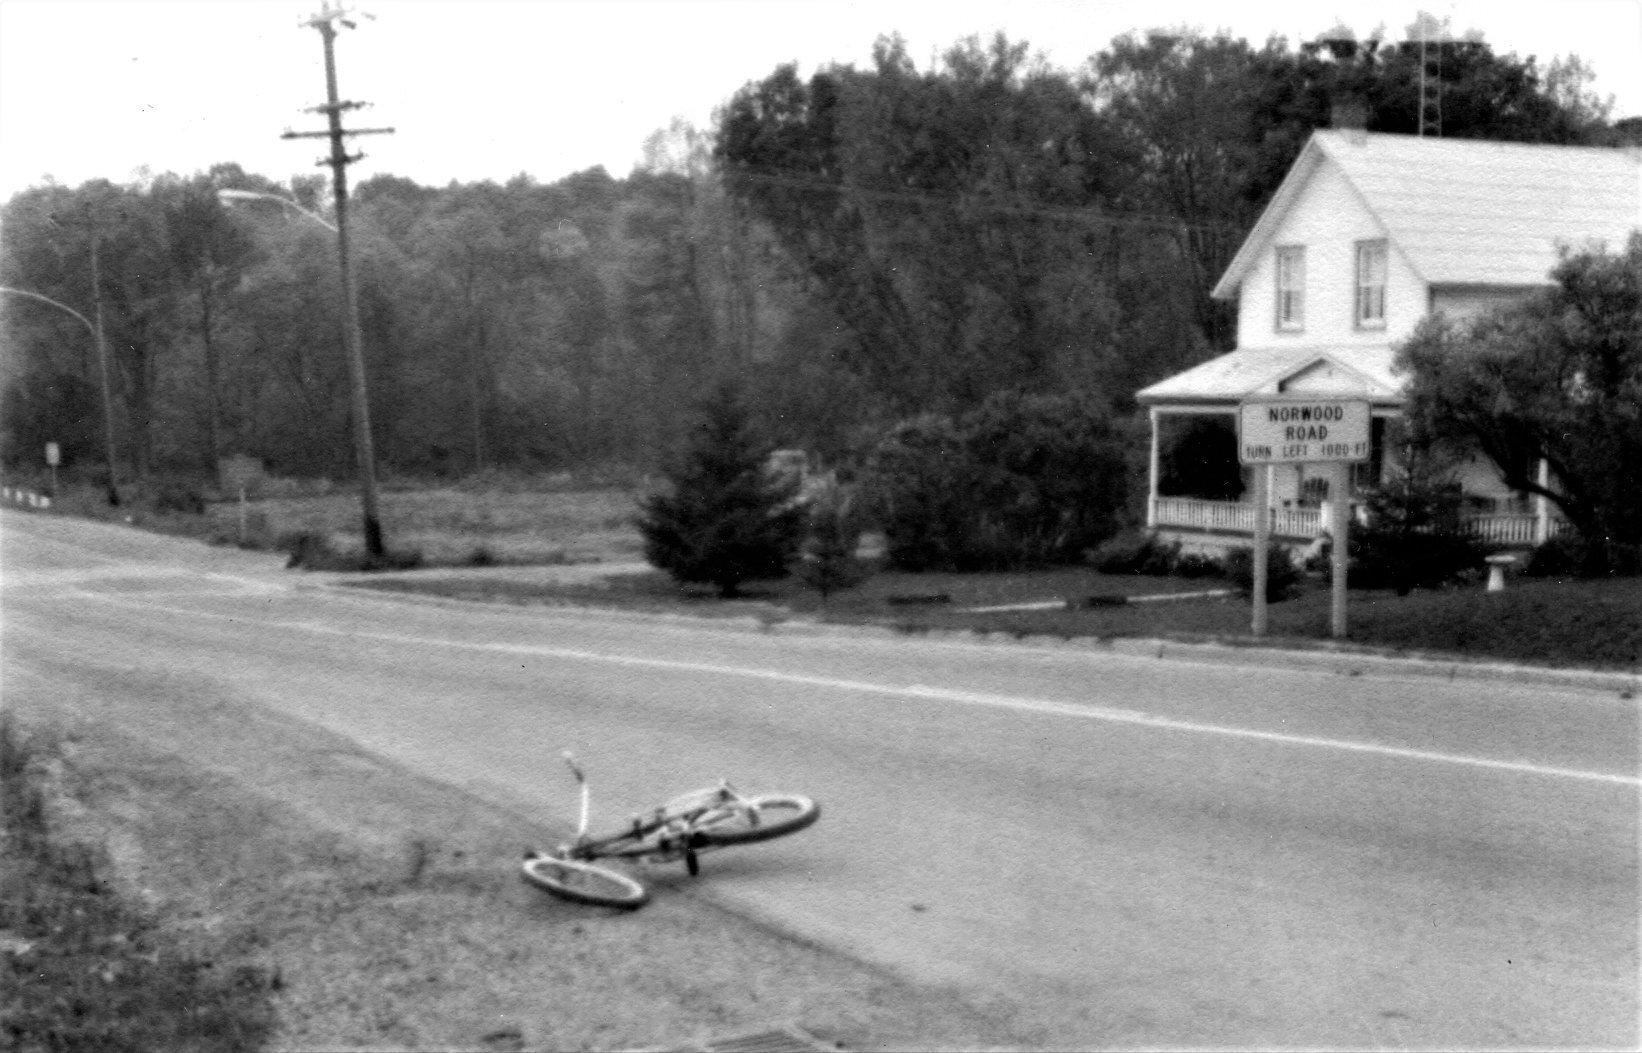 Thomas Empey's bike  1970 accident